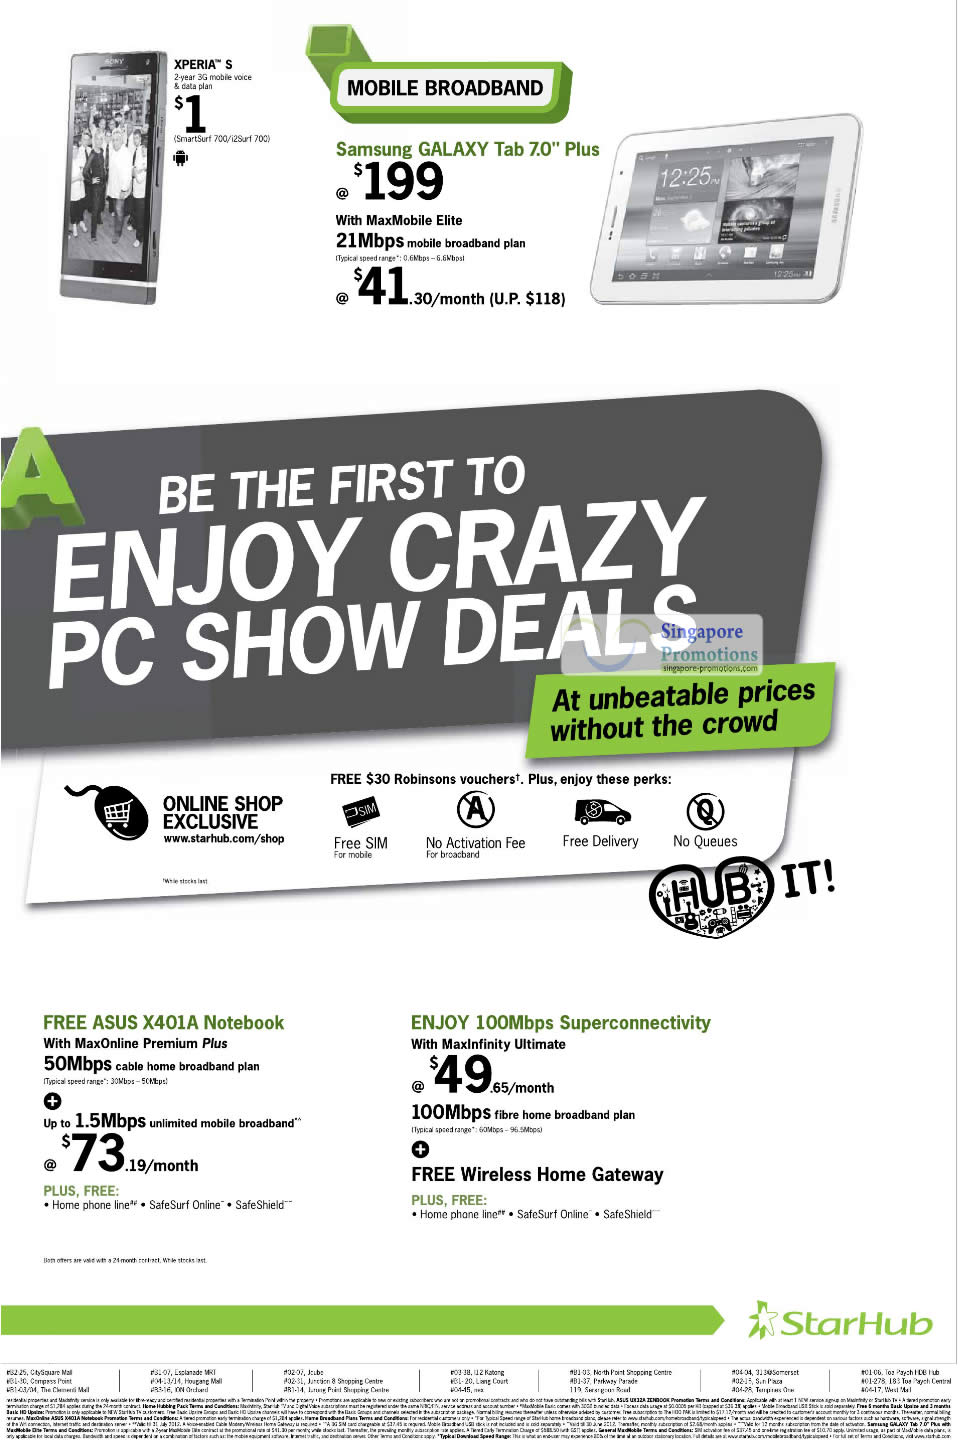 Sony Xperia S, Samsung Galaxy Tab 7.0 Plus, ASUS X401A Notebook